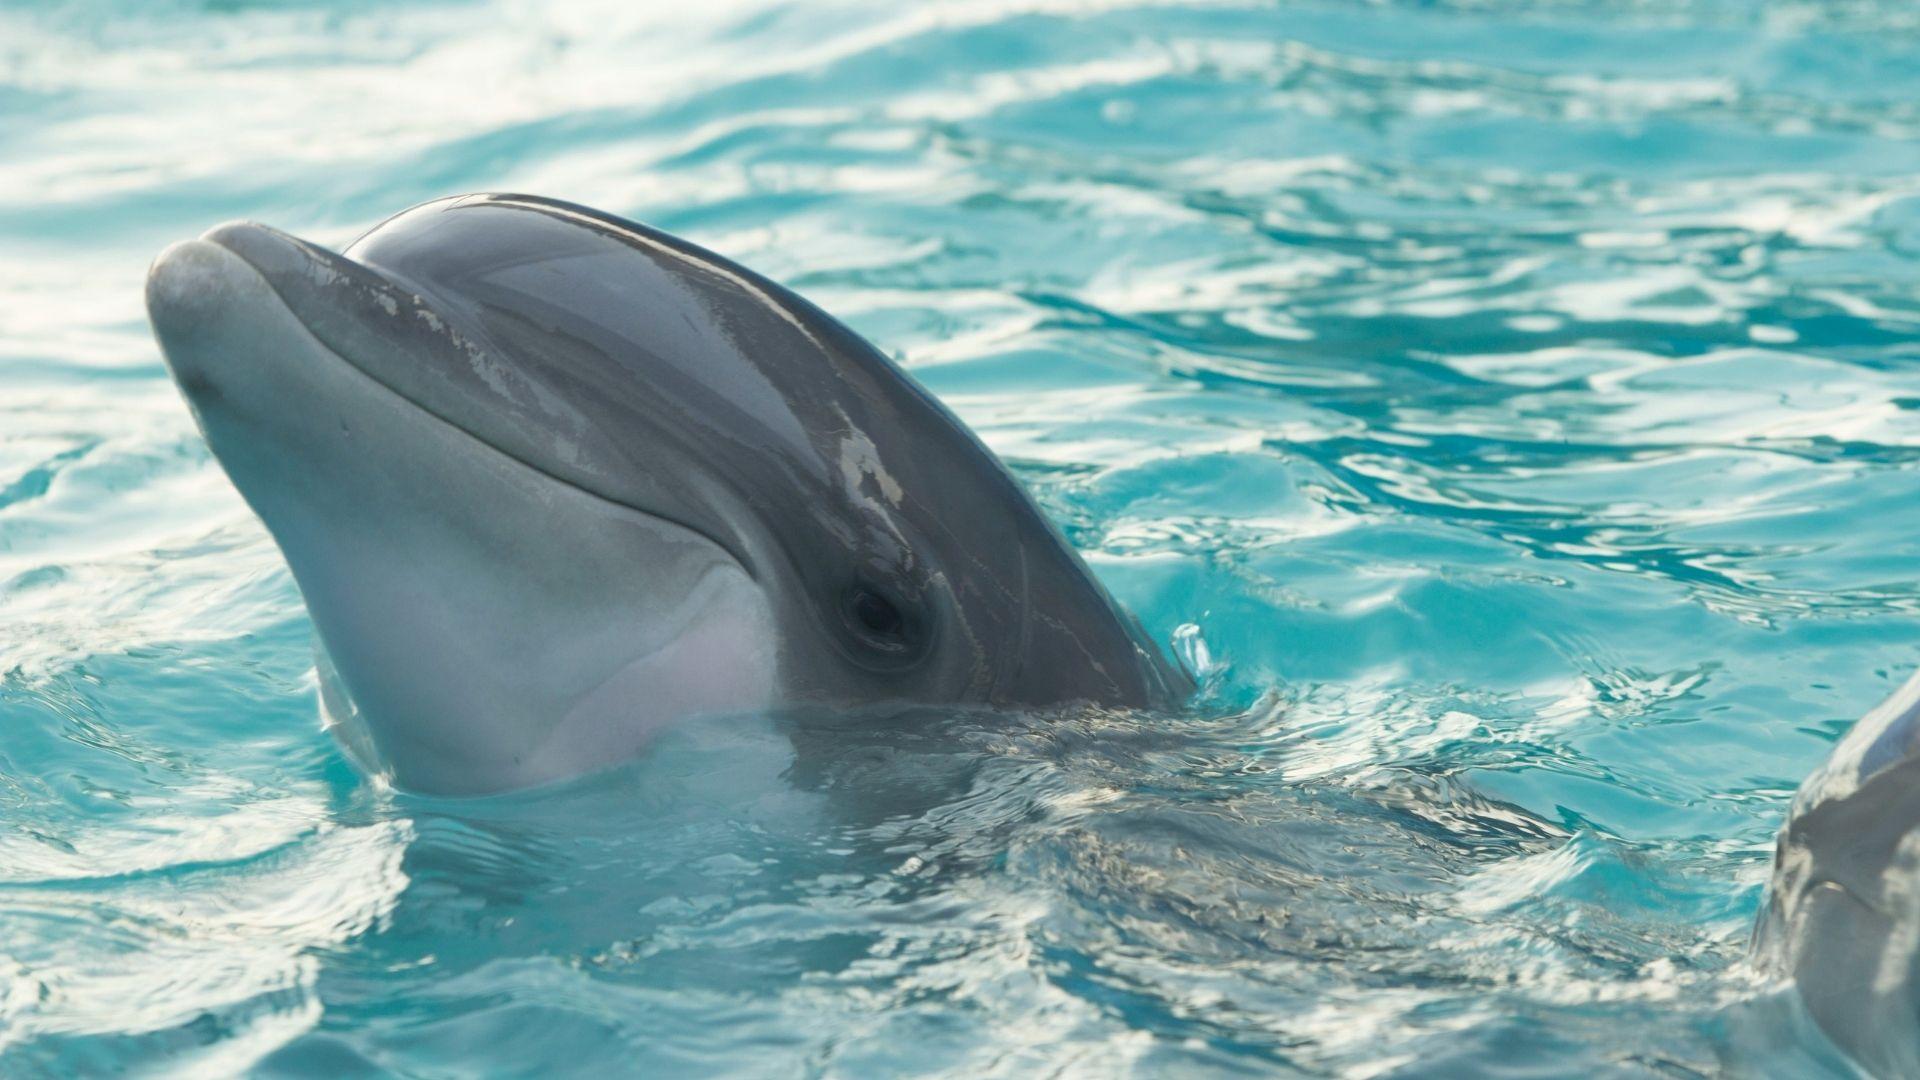 Hombre salva la vida de un delfín